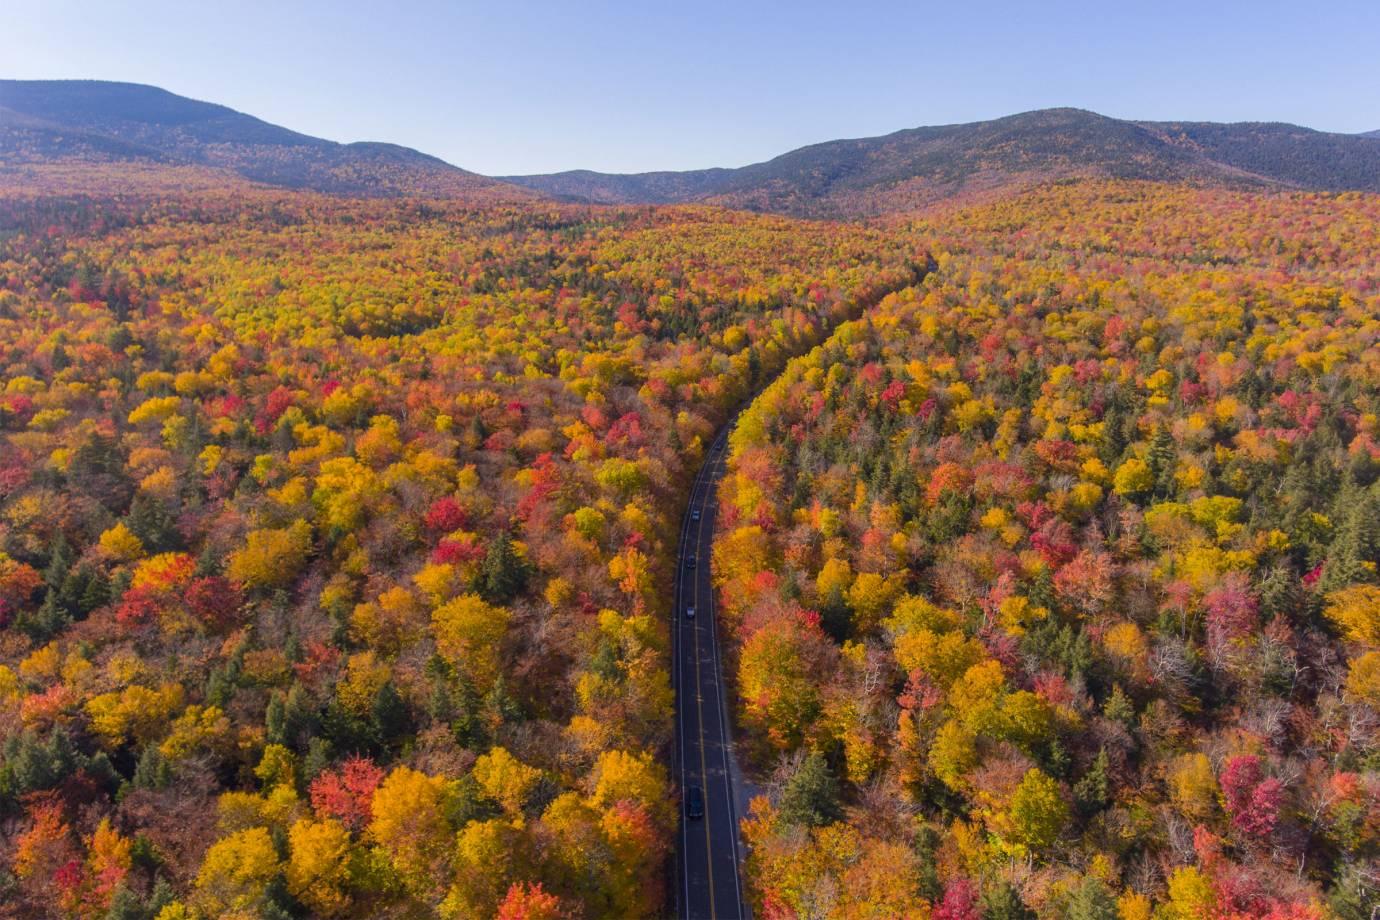 Kancamagus Highway, New Hampshire